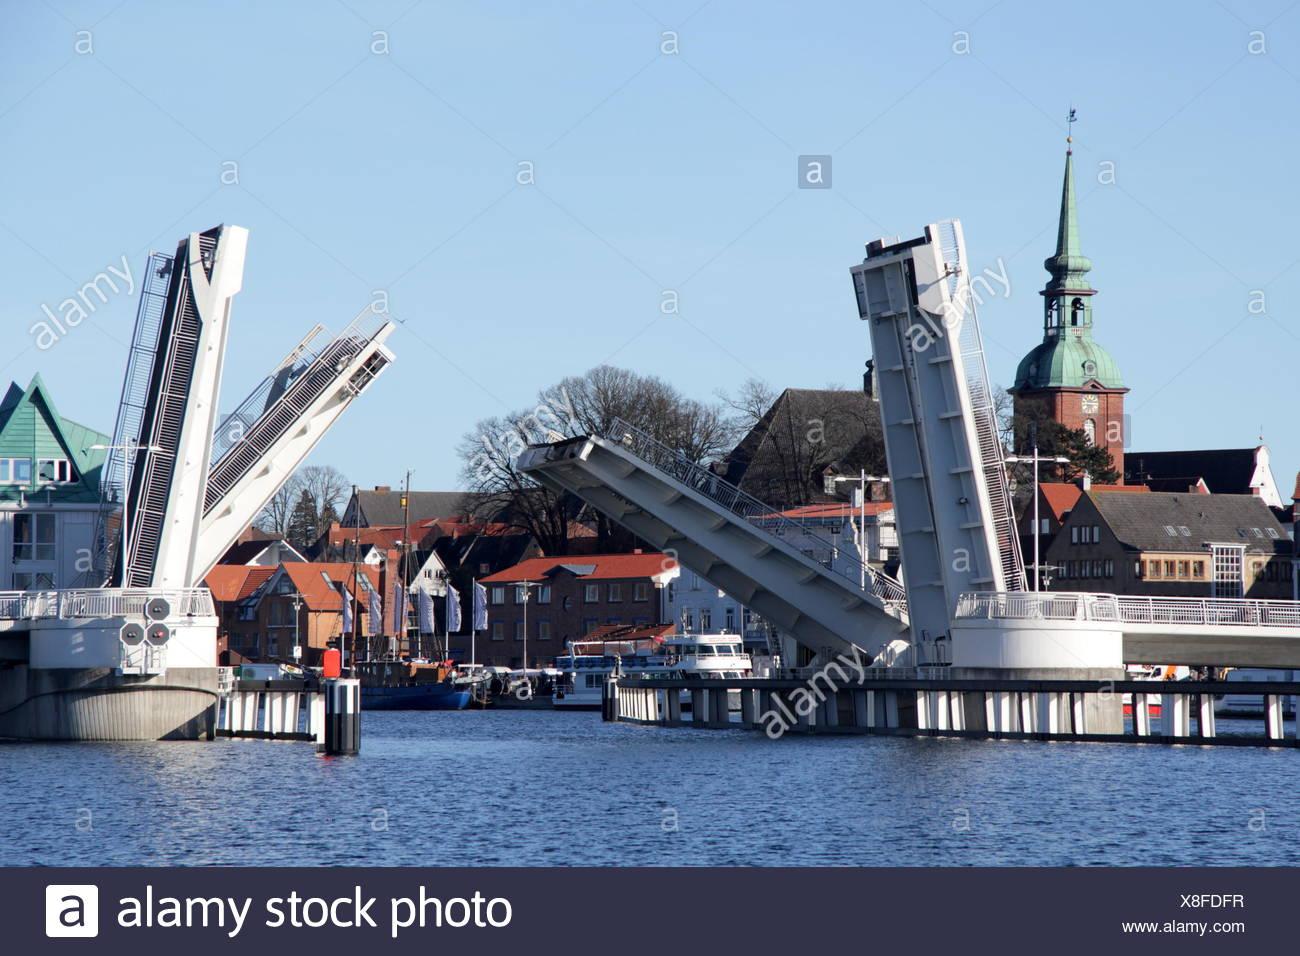 opening flap bridge in Kappeln from waterside - Stock Image